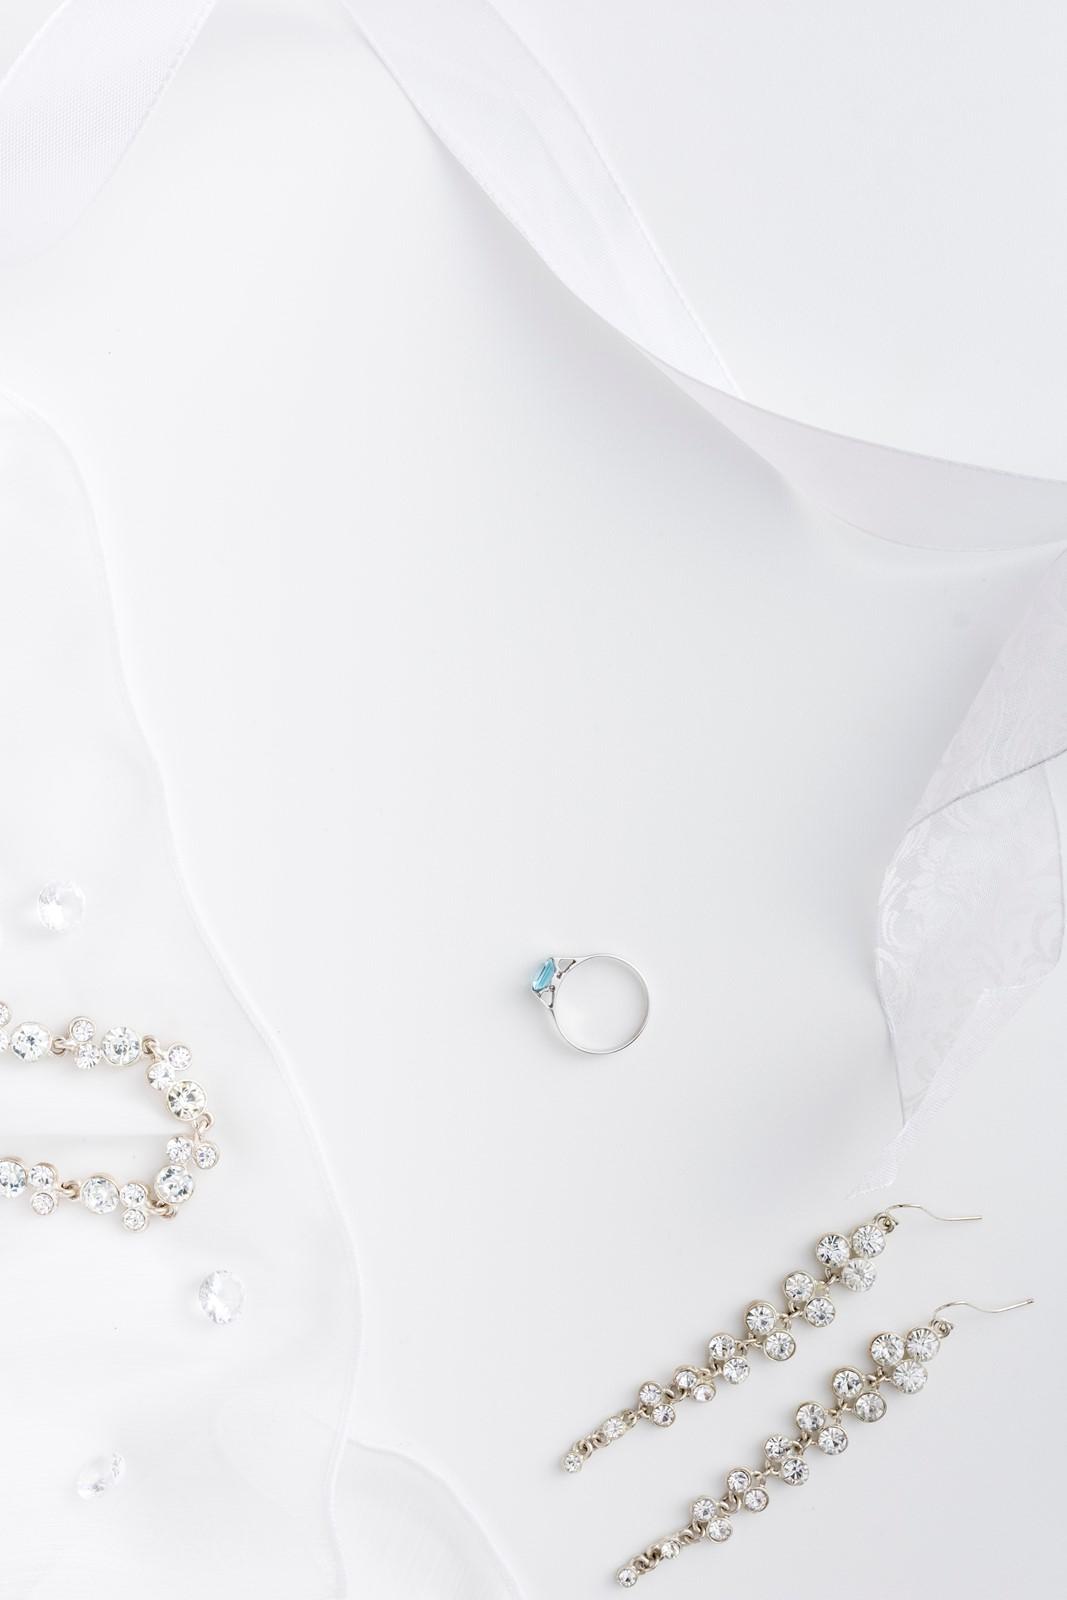 Jewelry Minimalistic Line Sheet